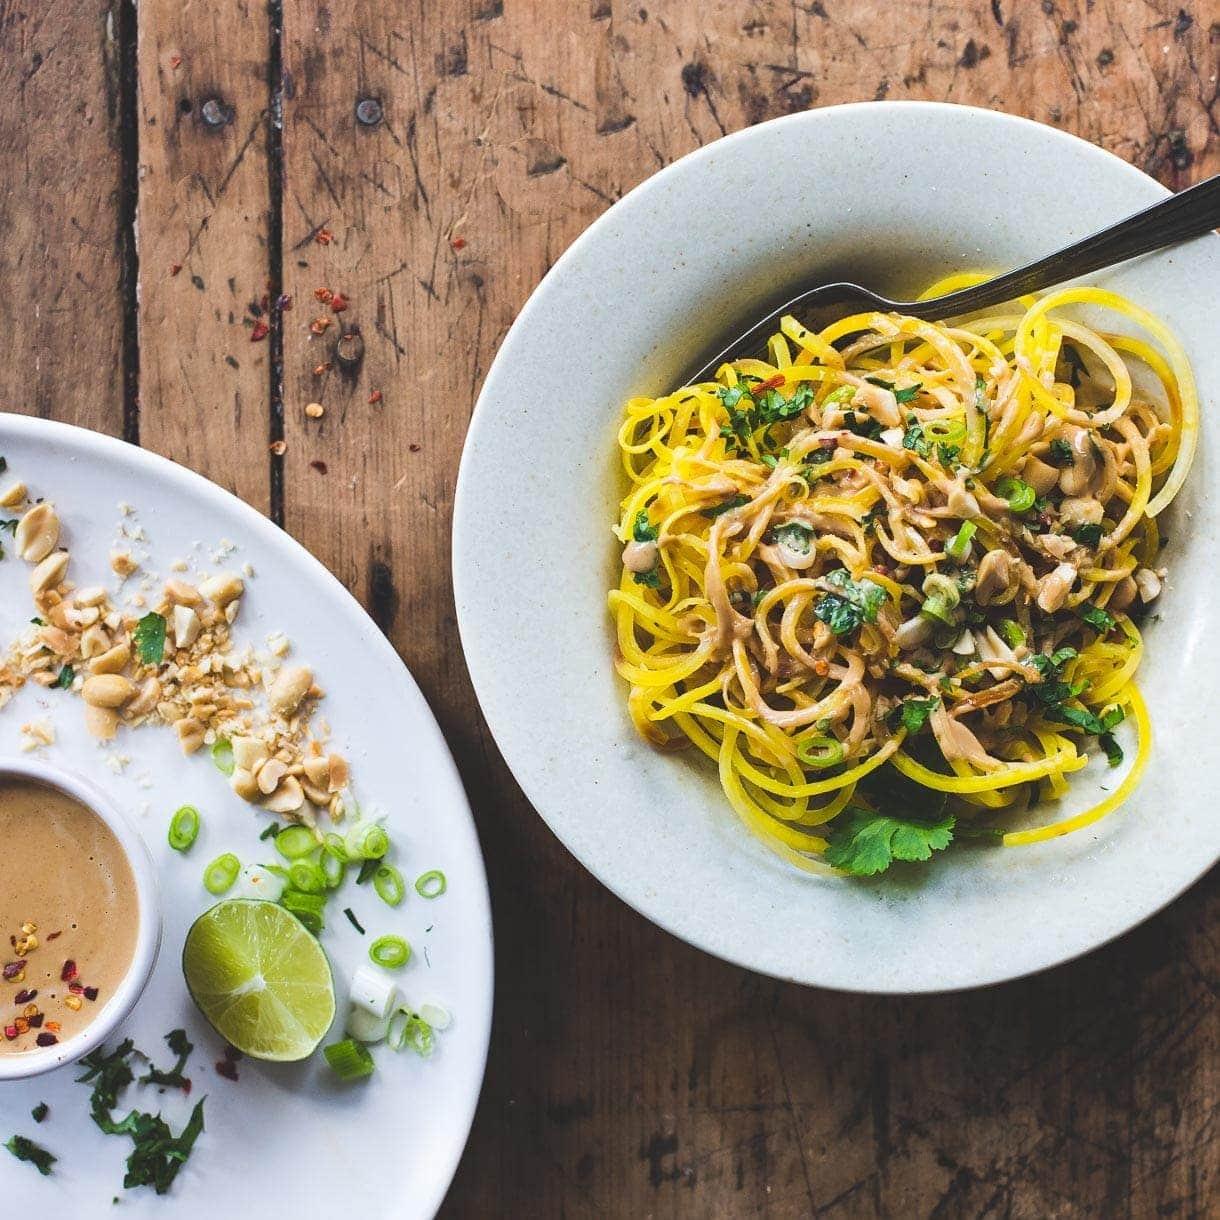 Golden Beet Noodles with Spicy Peanut Sauce